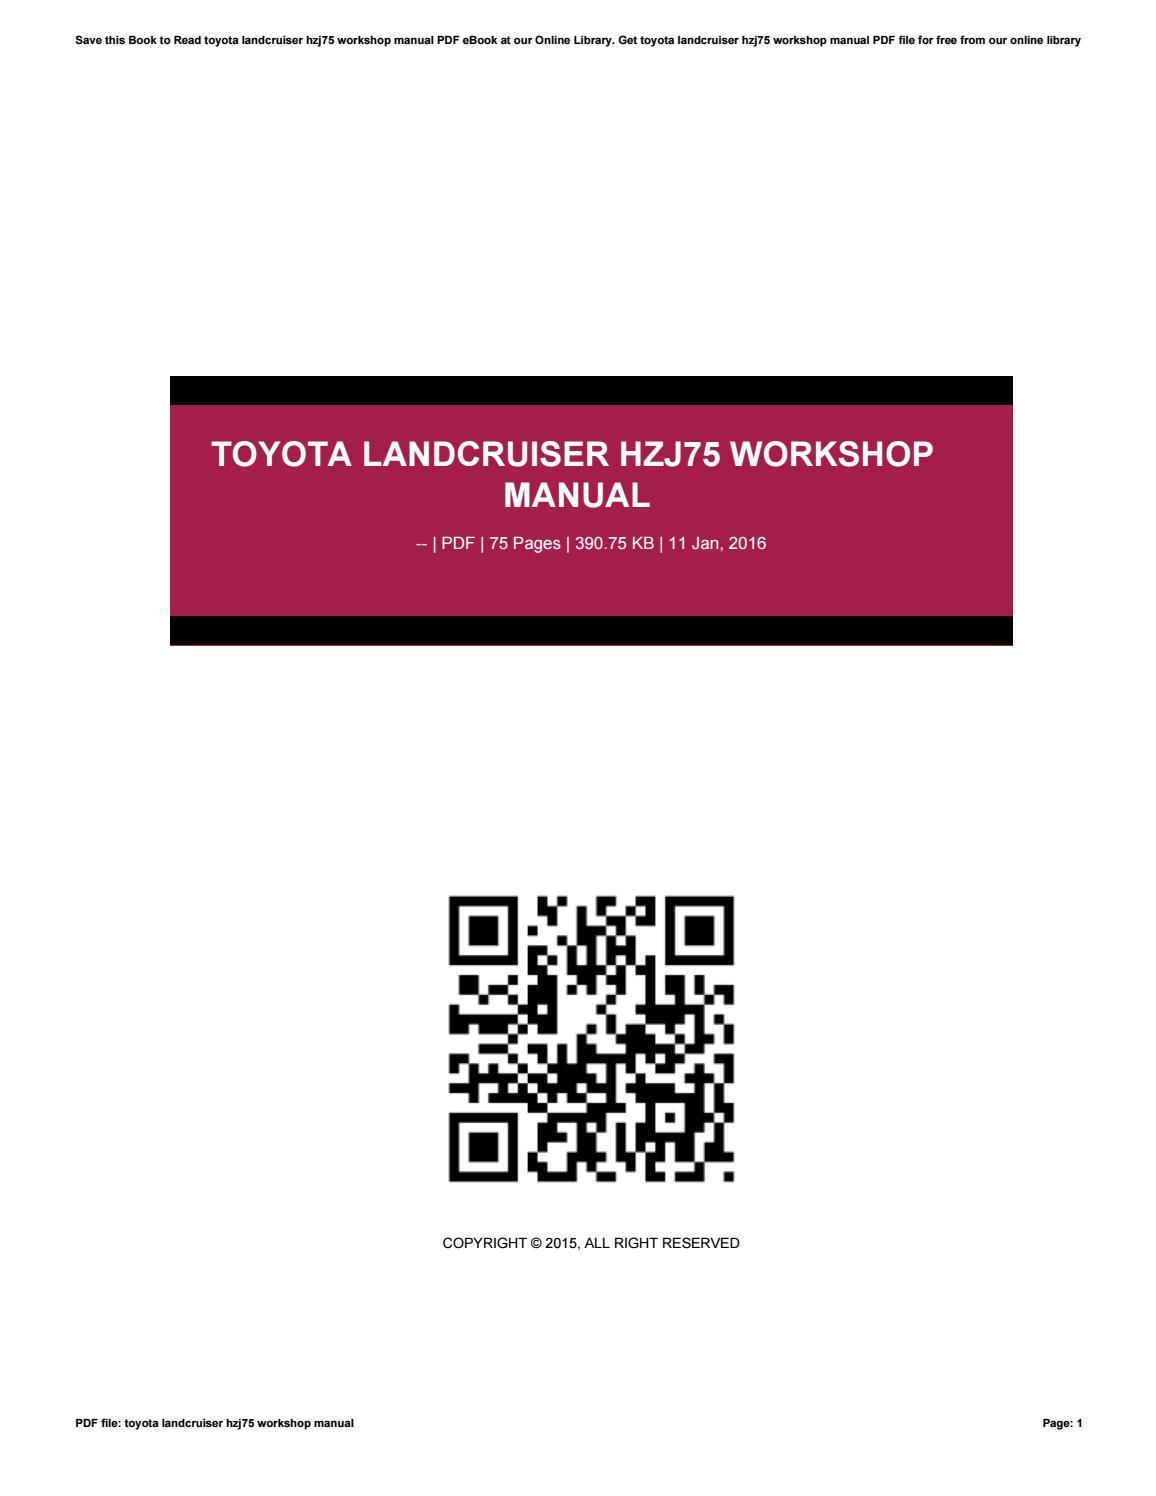 Toyota landcruiser hzj75 workshop manual by ratih39dewiana